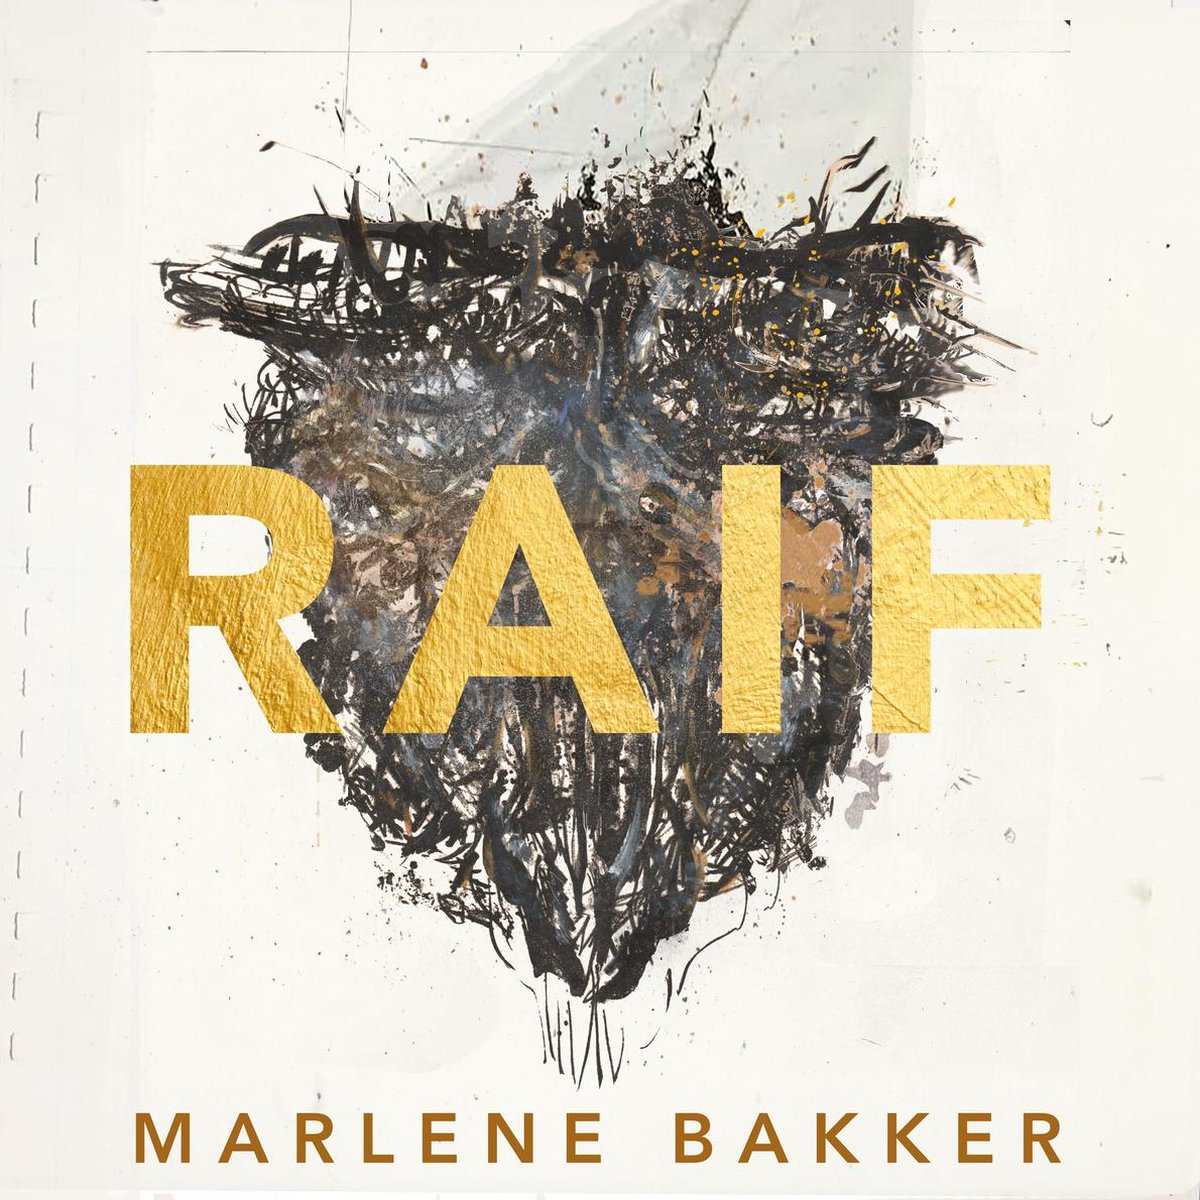 Raif - Marlene Bakker